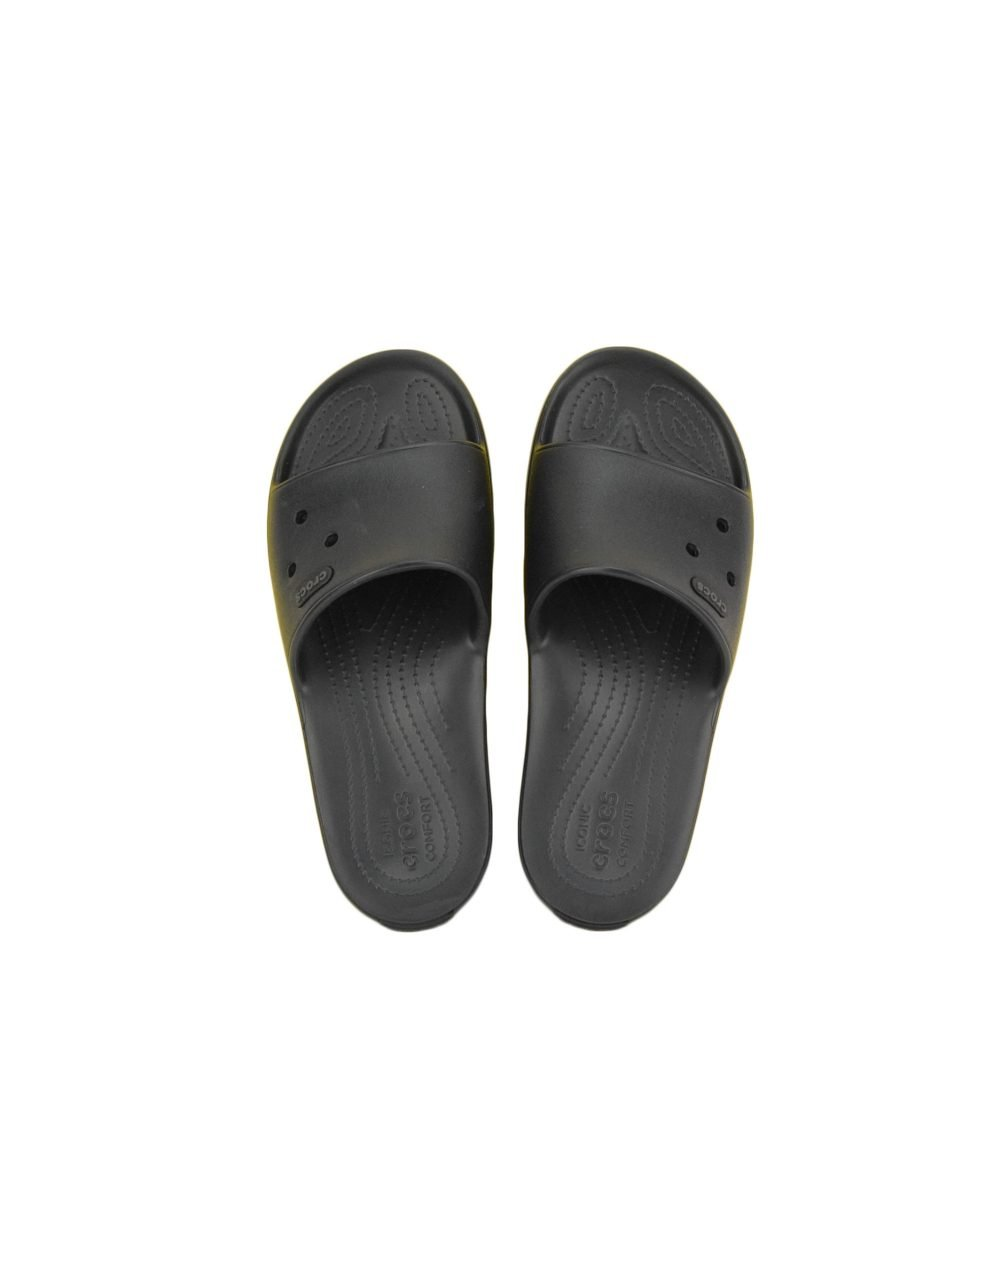 Crocs Crocband III Slide (205733-02S) Black/Graphite